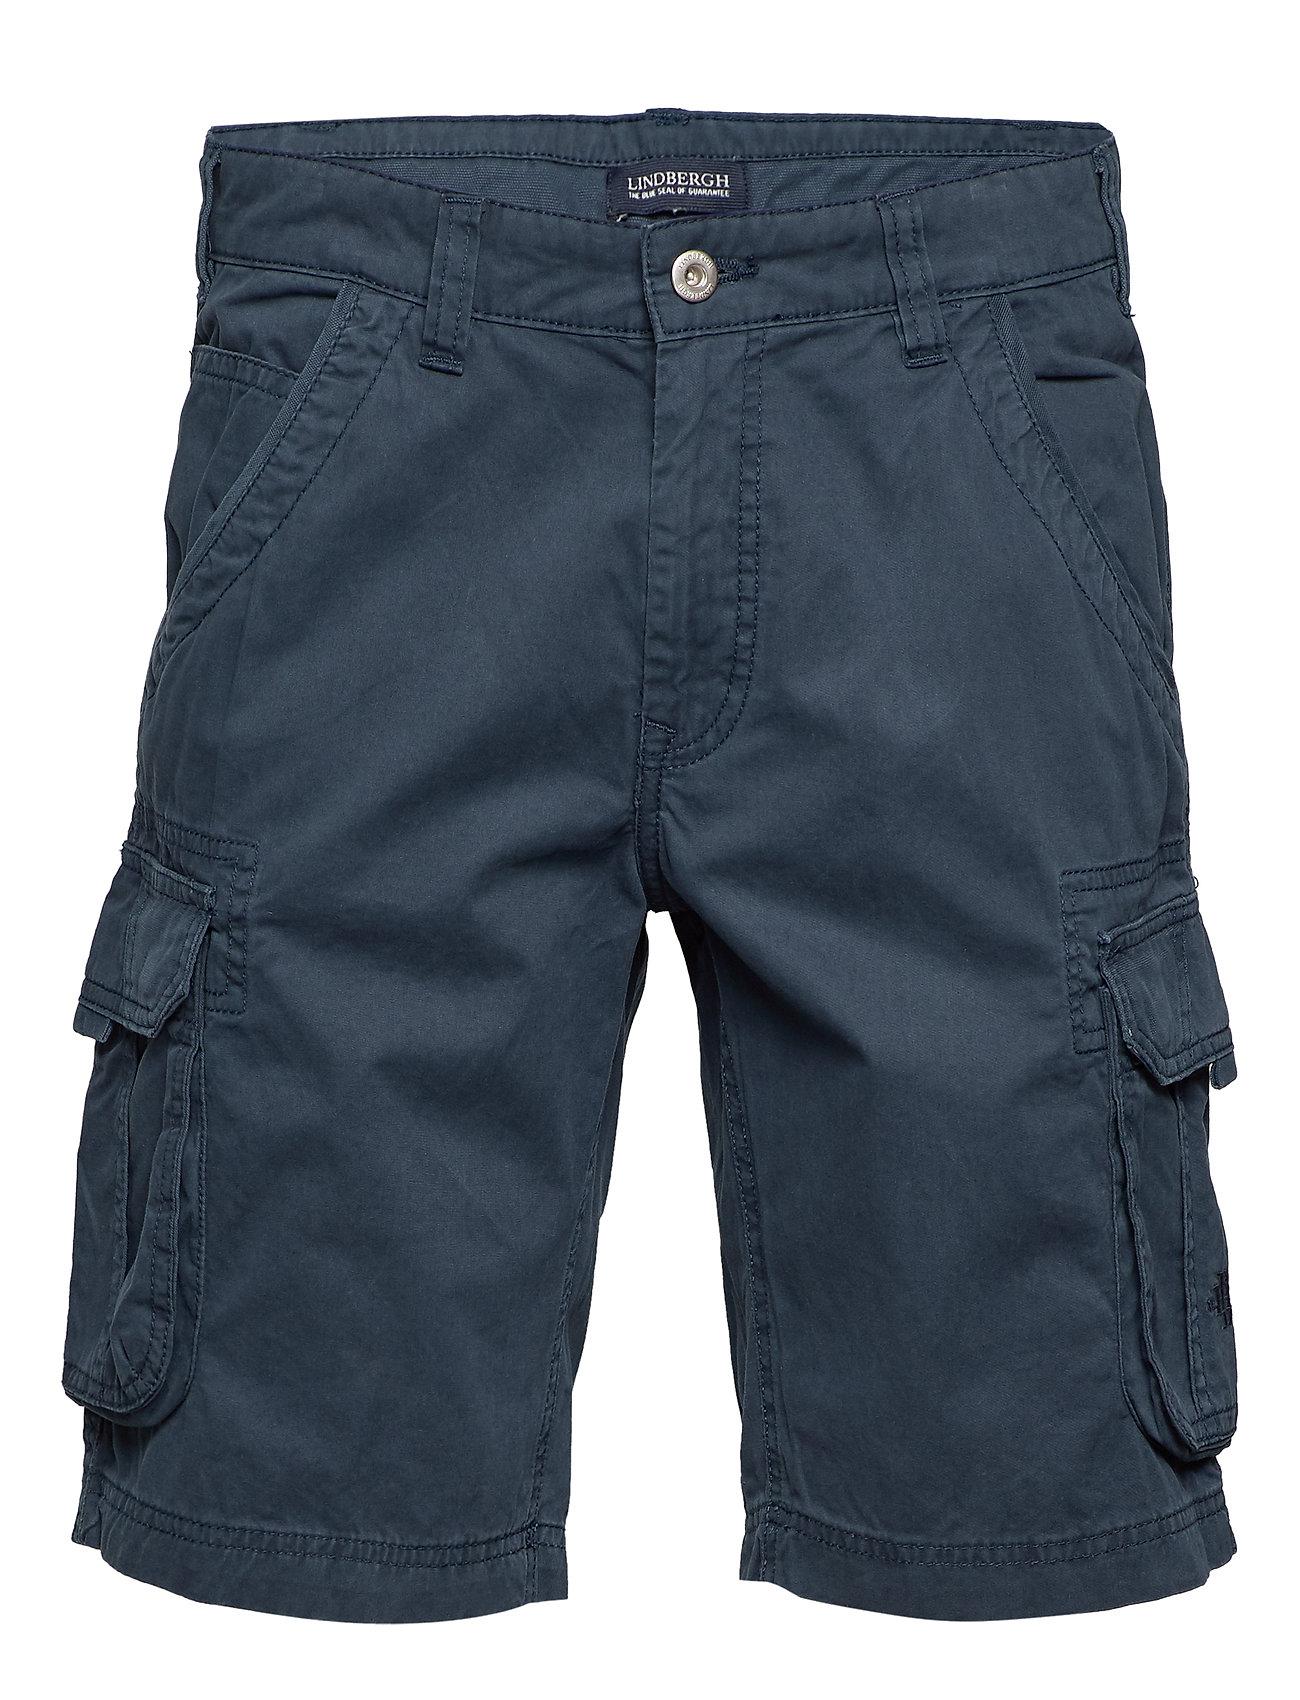 Lindbergh Garment dyed cargo shorts - DK BLUE